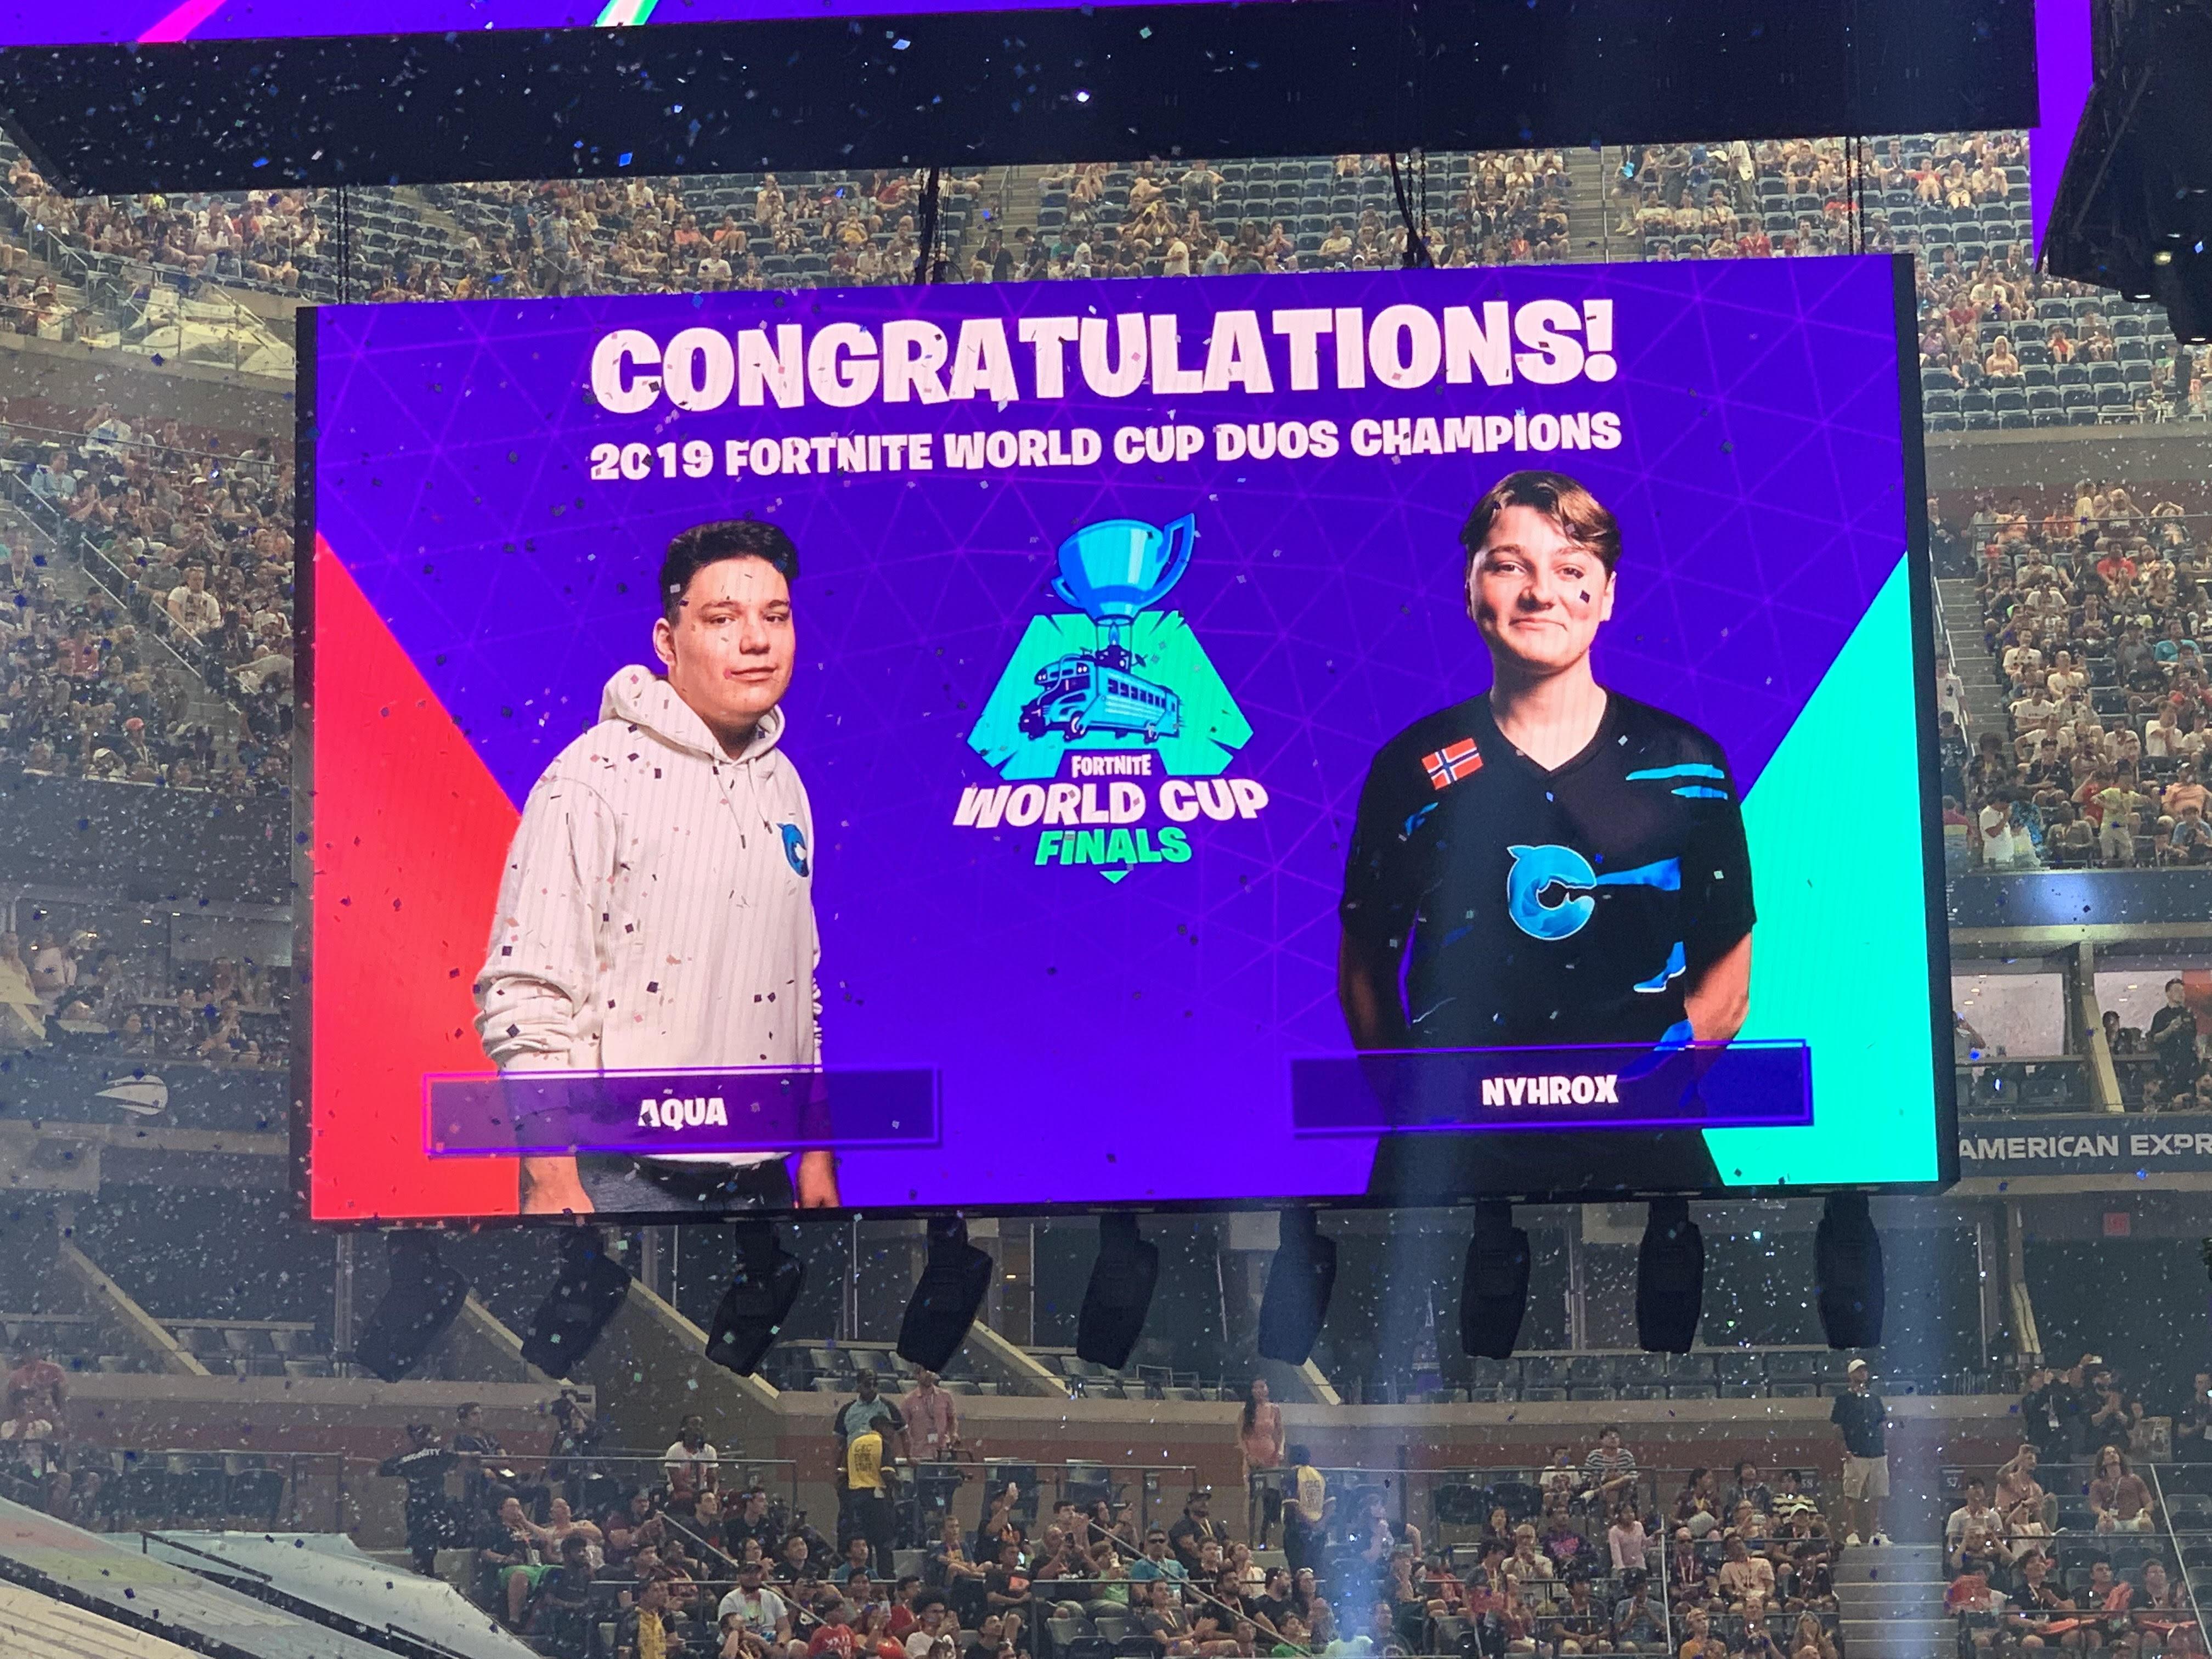 Aqua And Nyhrox Win The Fortnite Duos World Cup Shacknews